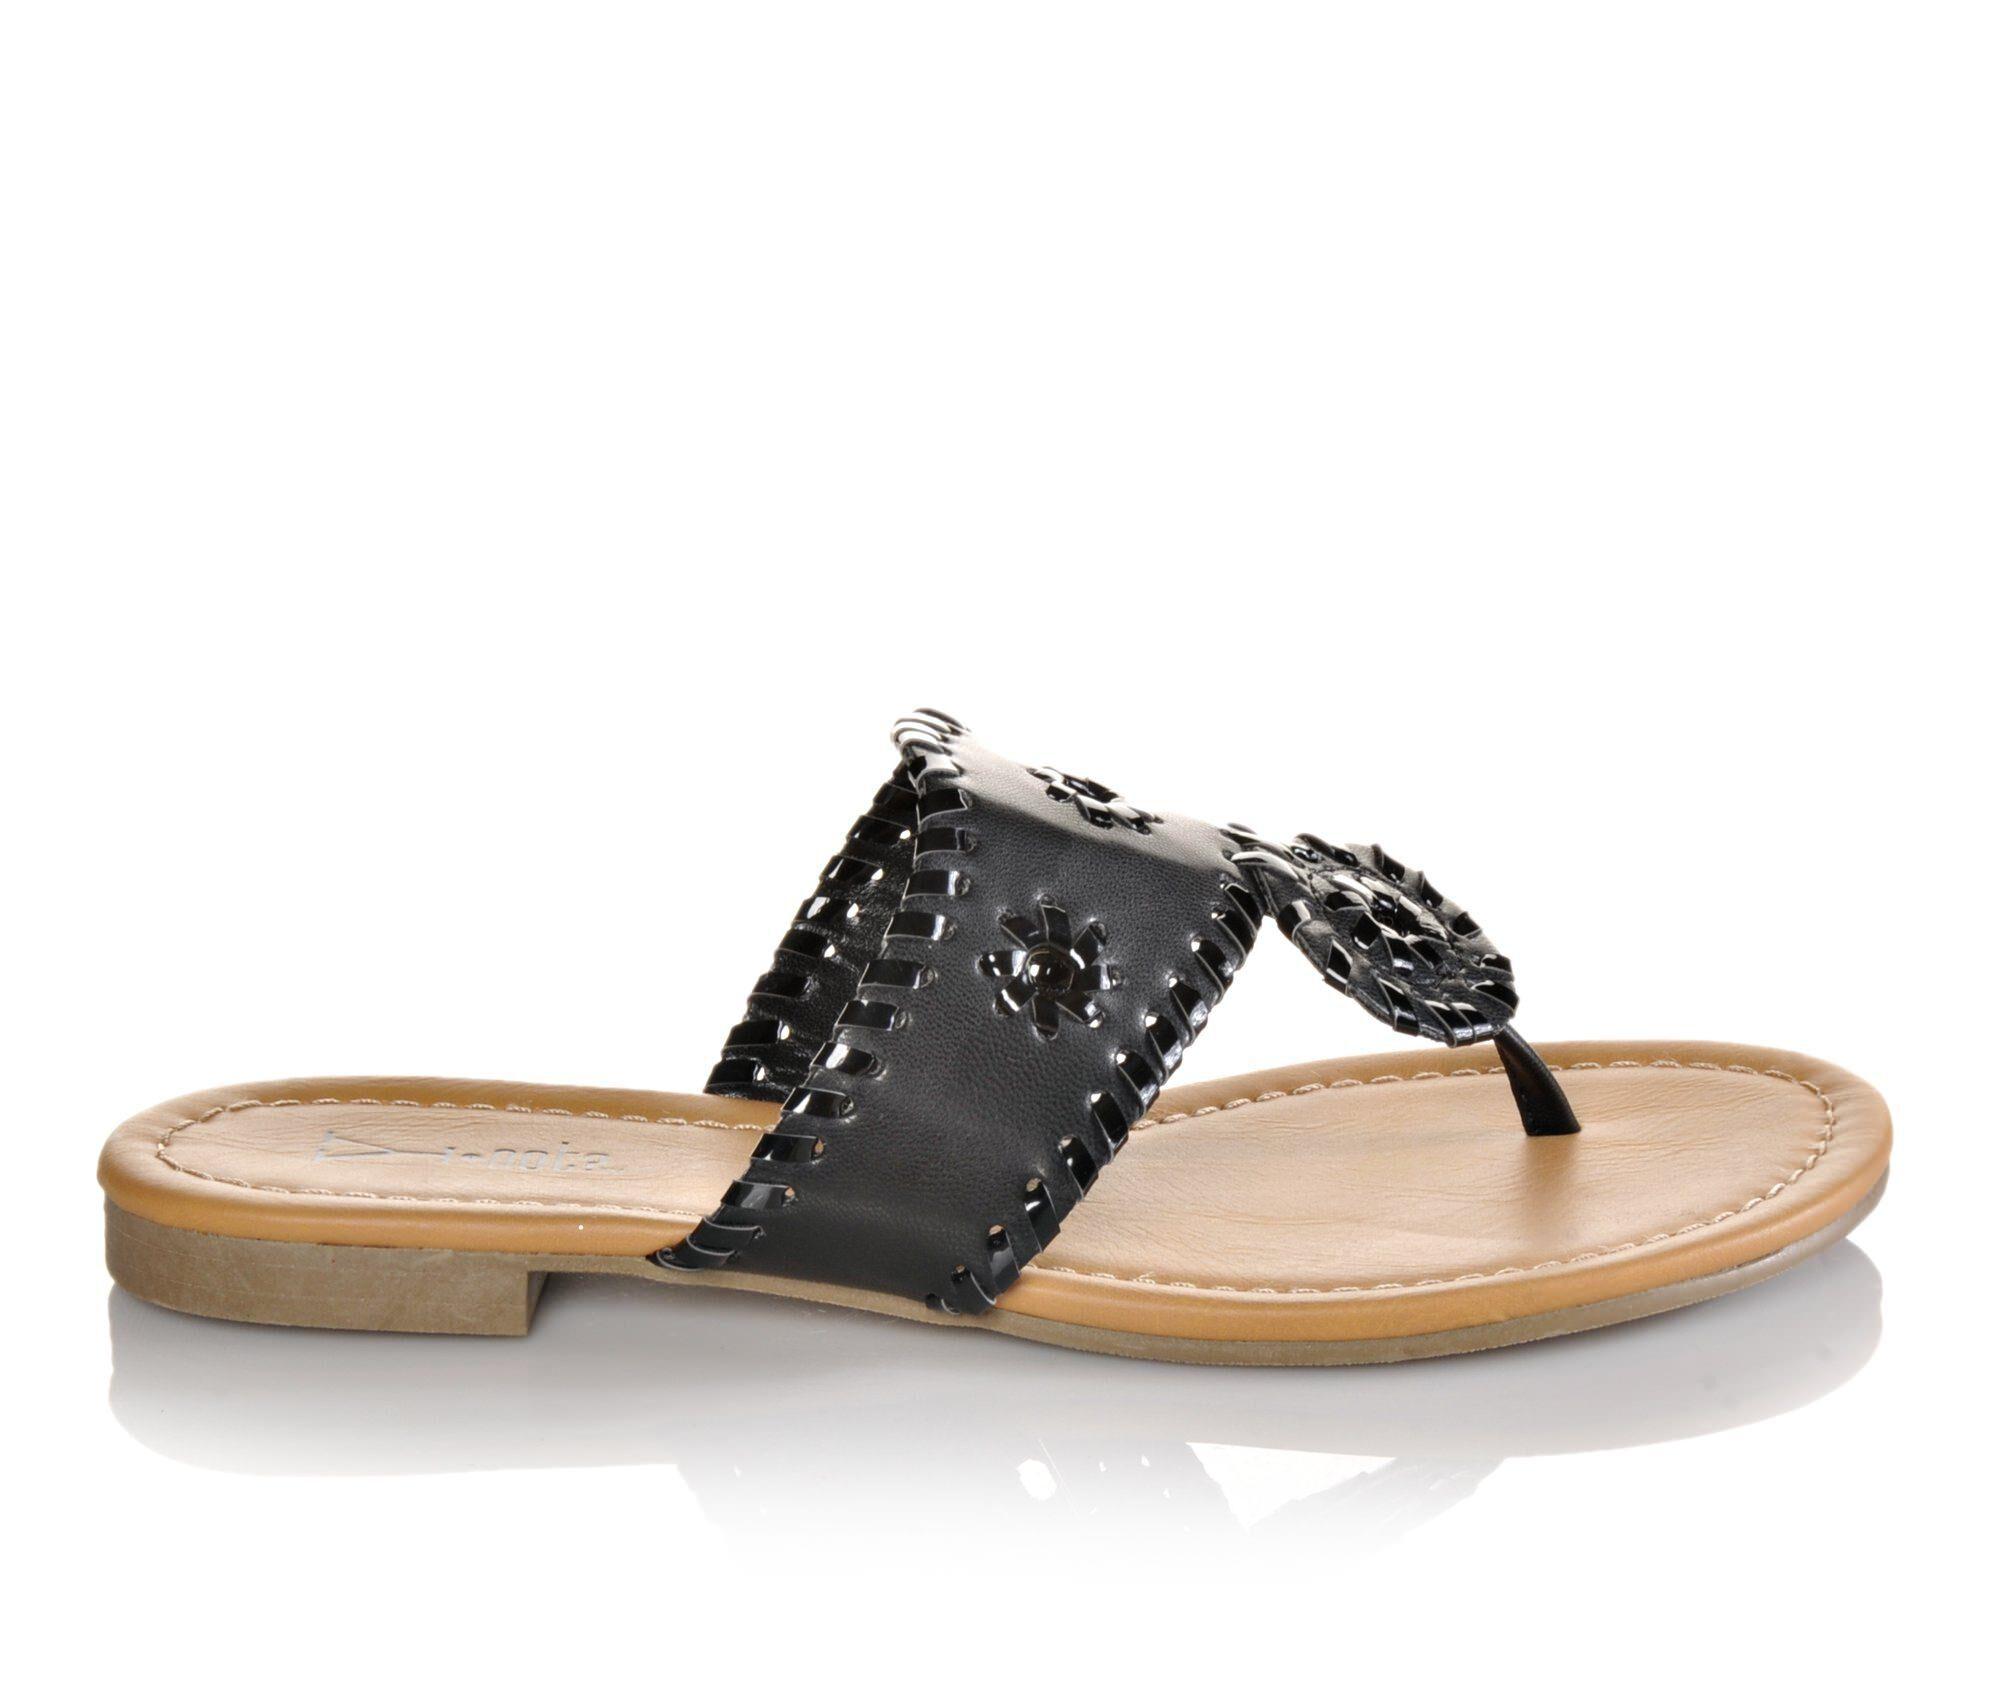 uk shoes_kd6792